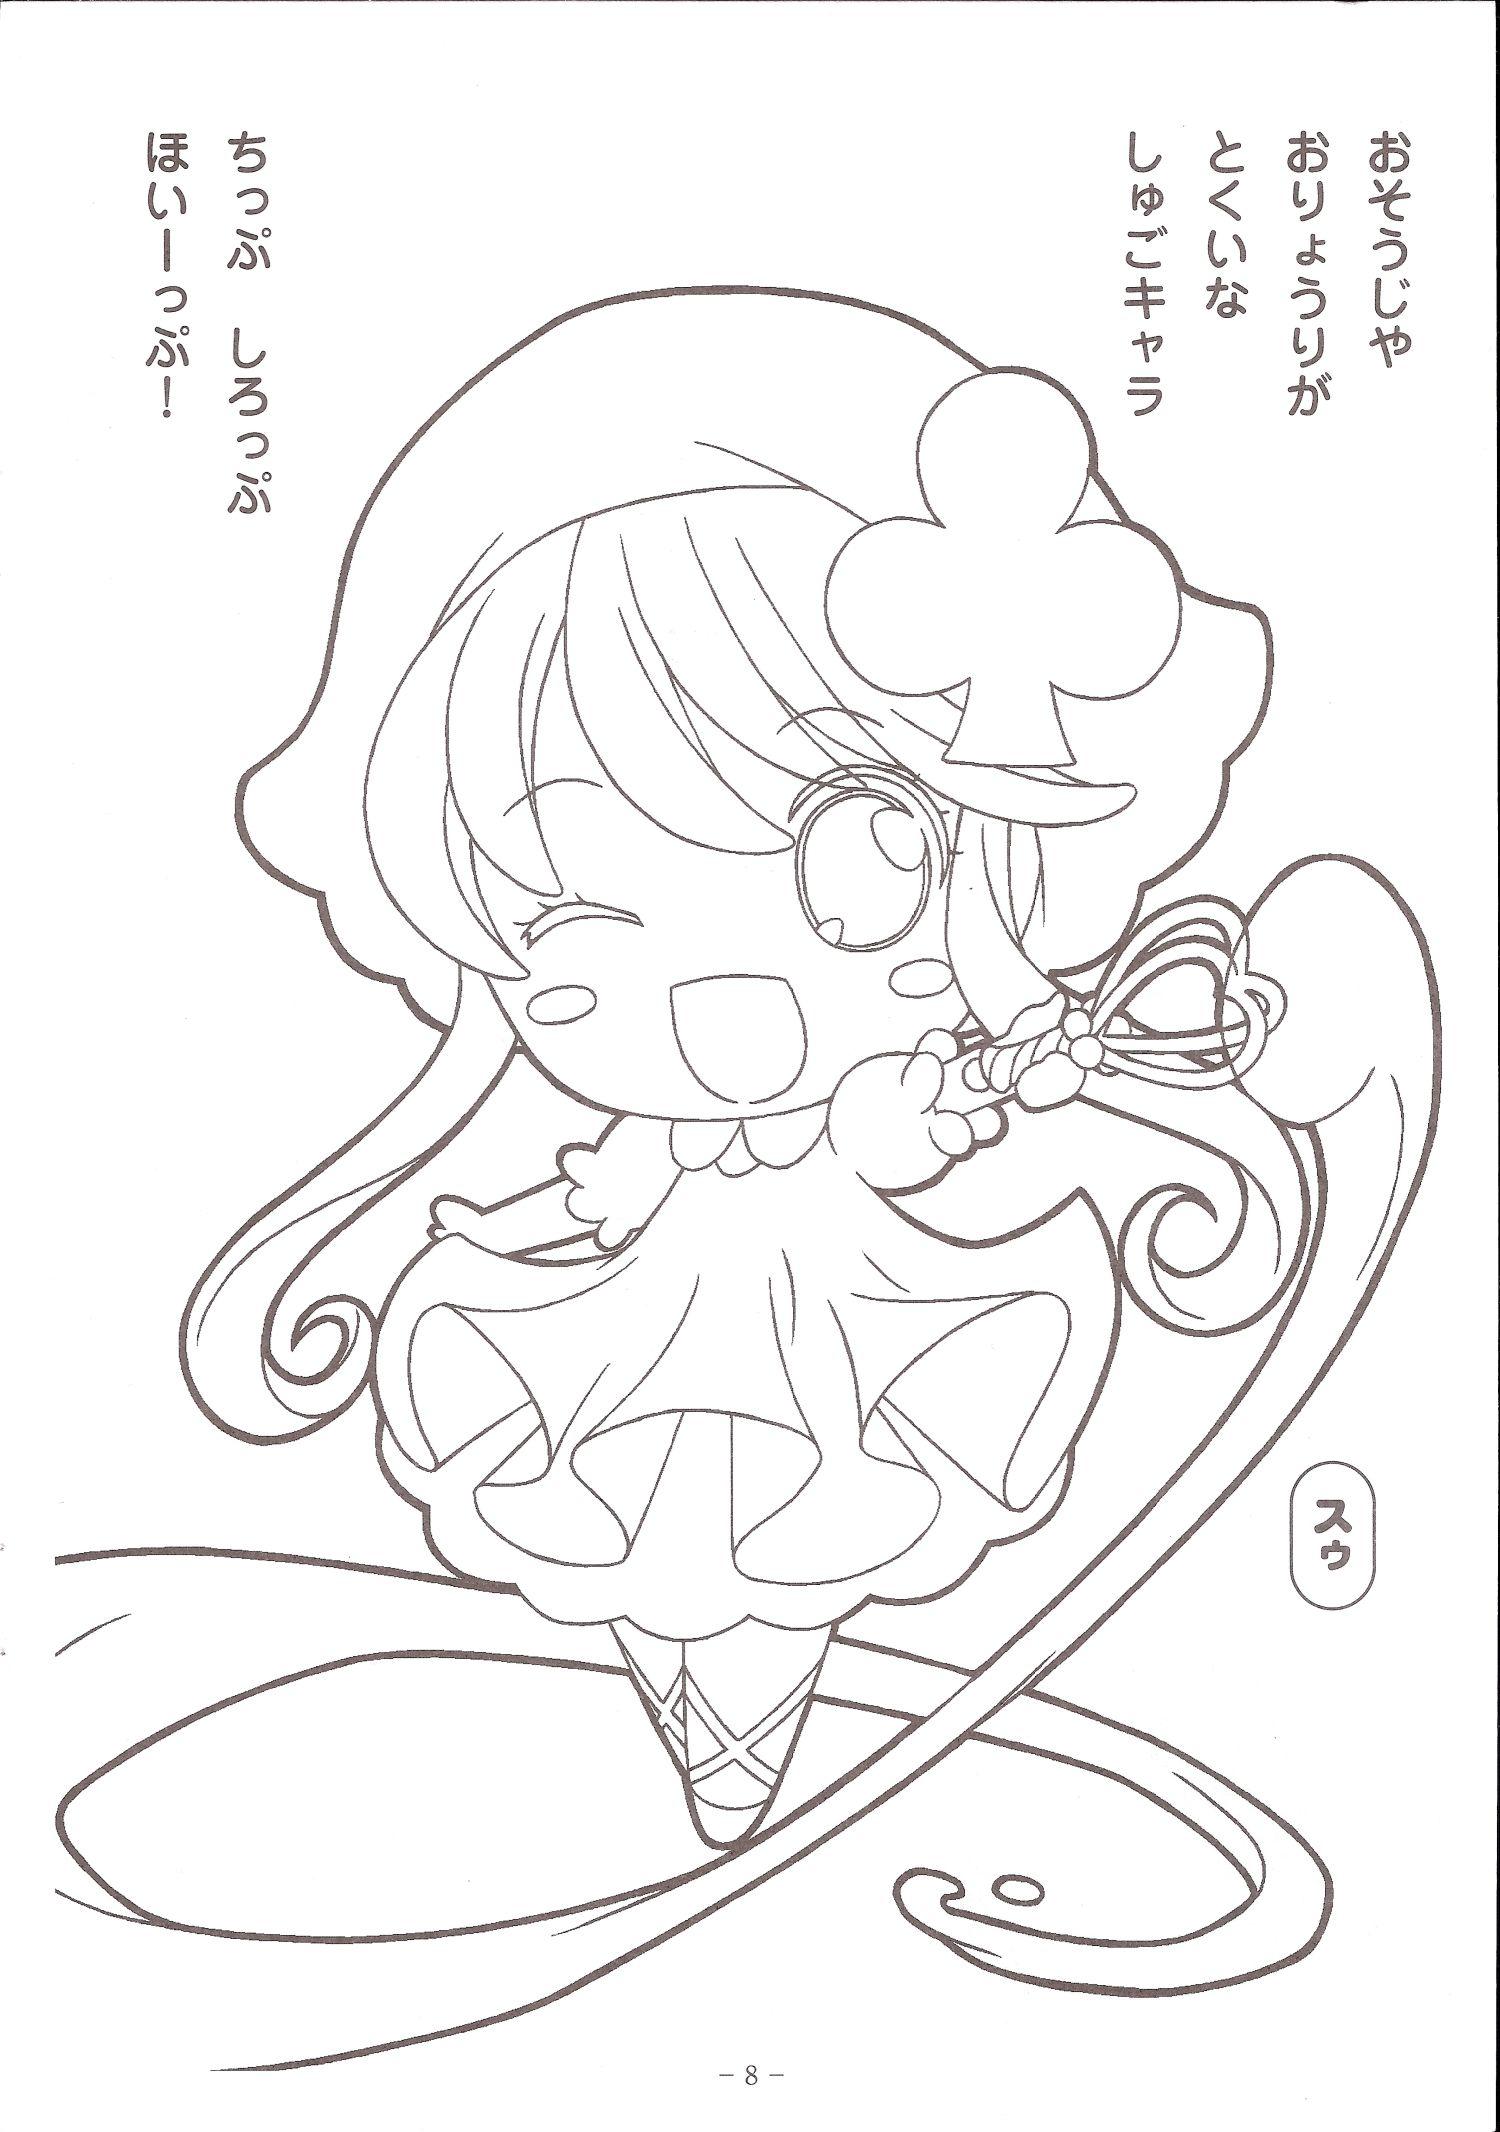 shugo chara coloring pages - photo#13